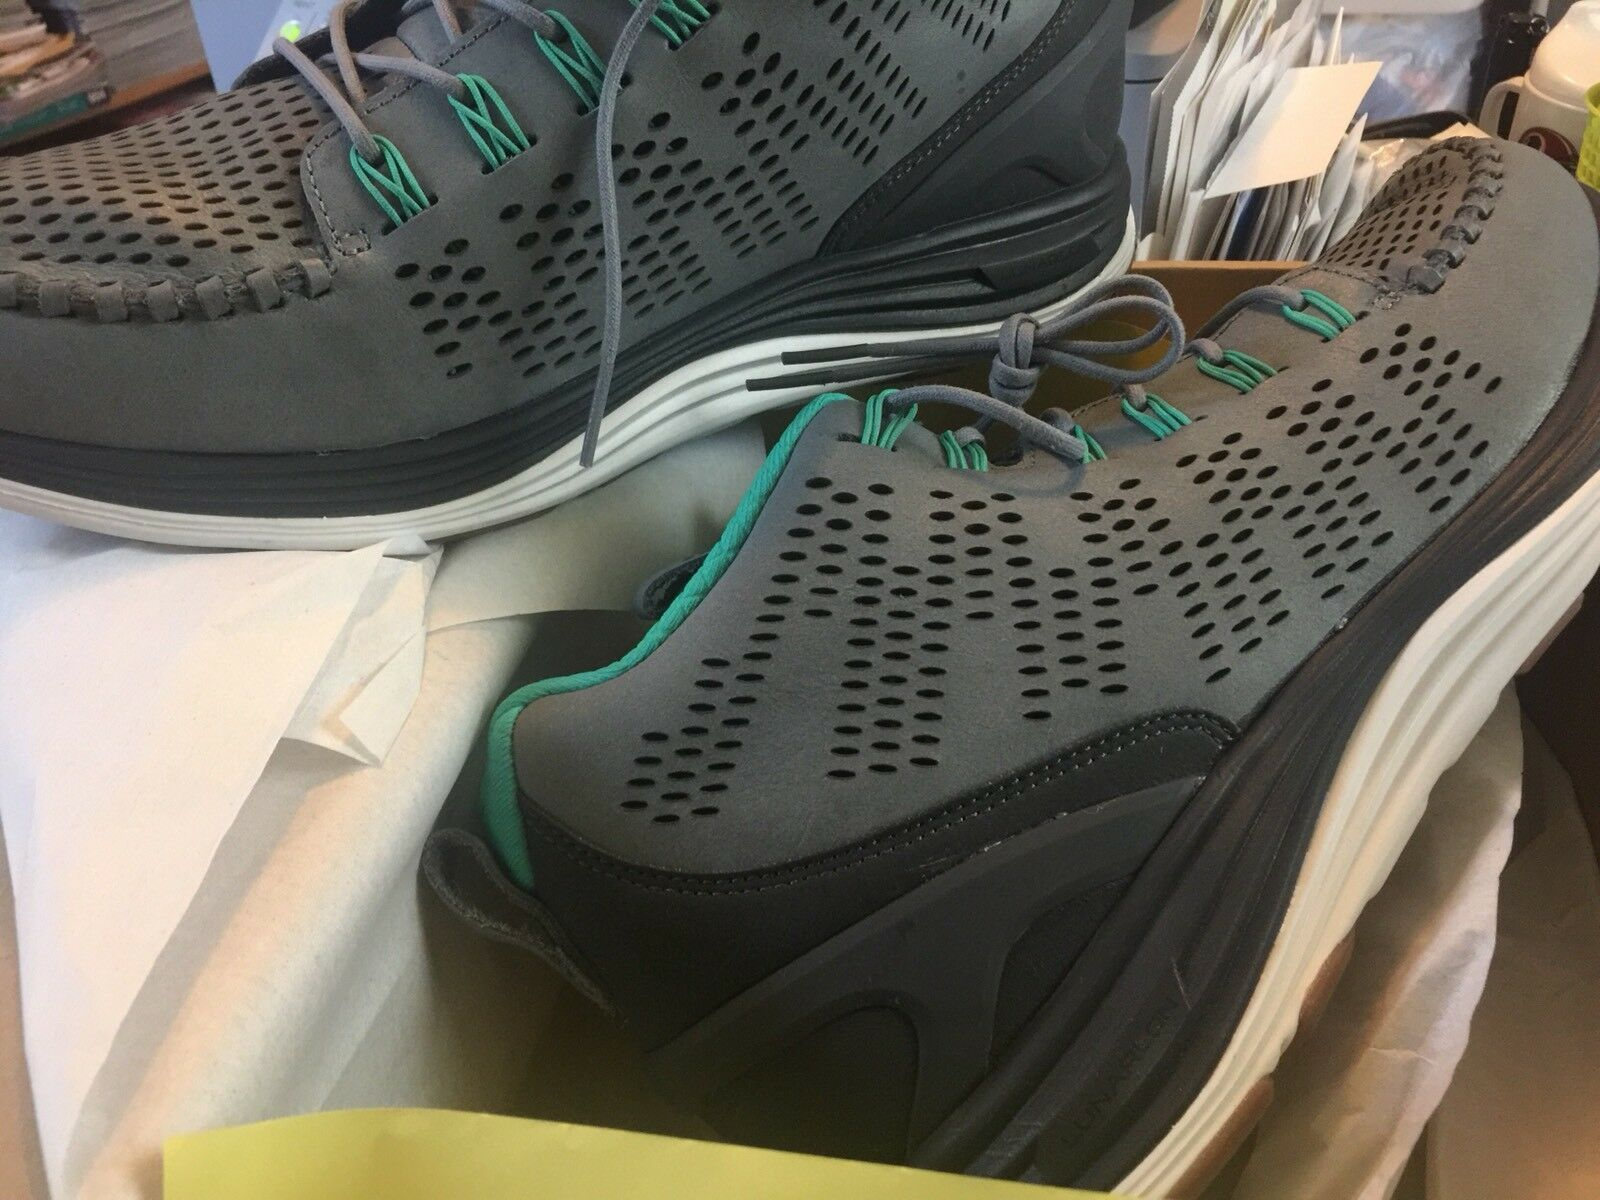 Nike lunar chenchukka qs sneakerStiefel kraft (553553 200) 52: 11 11 52: e8c9aa